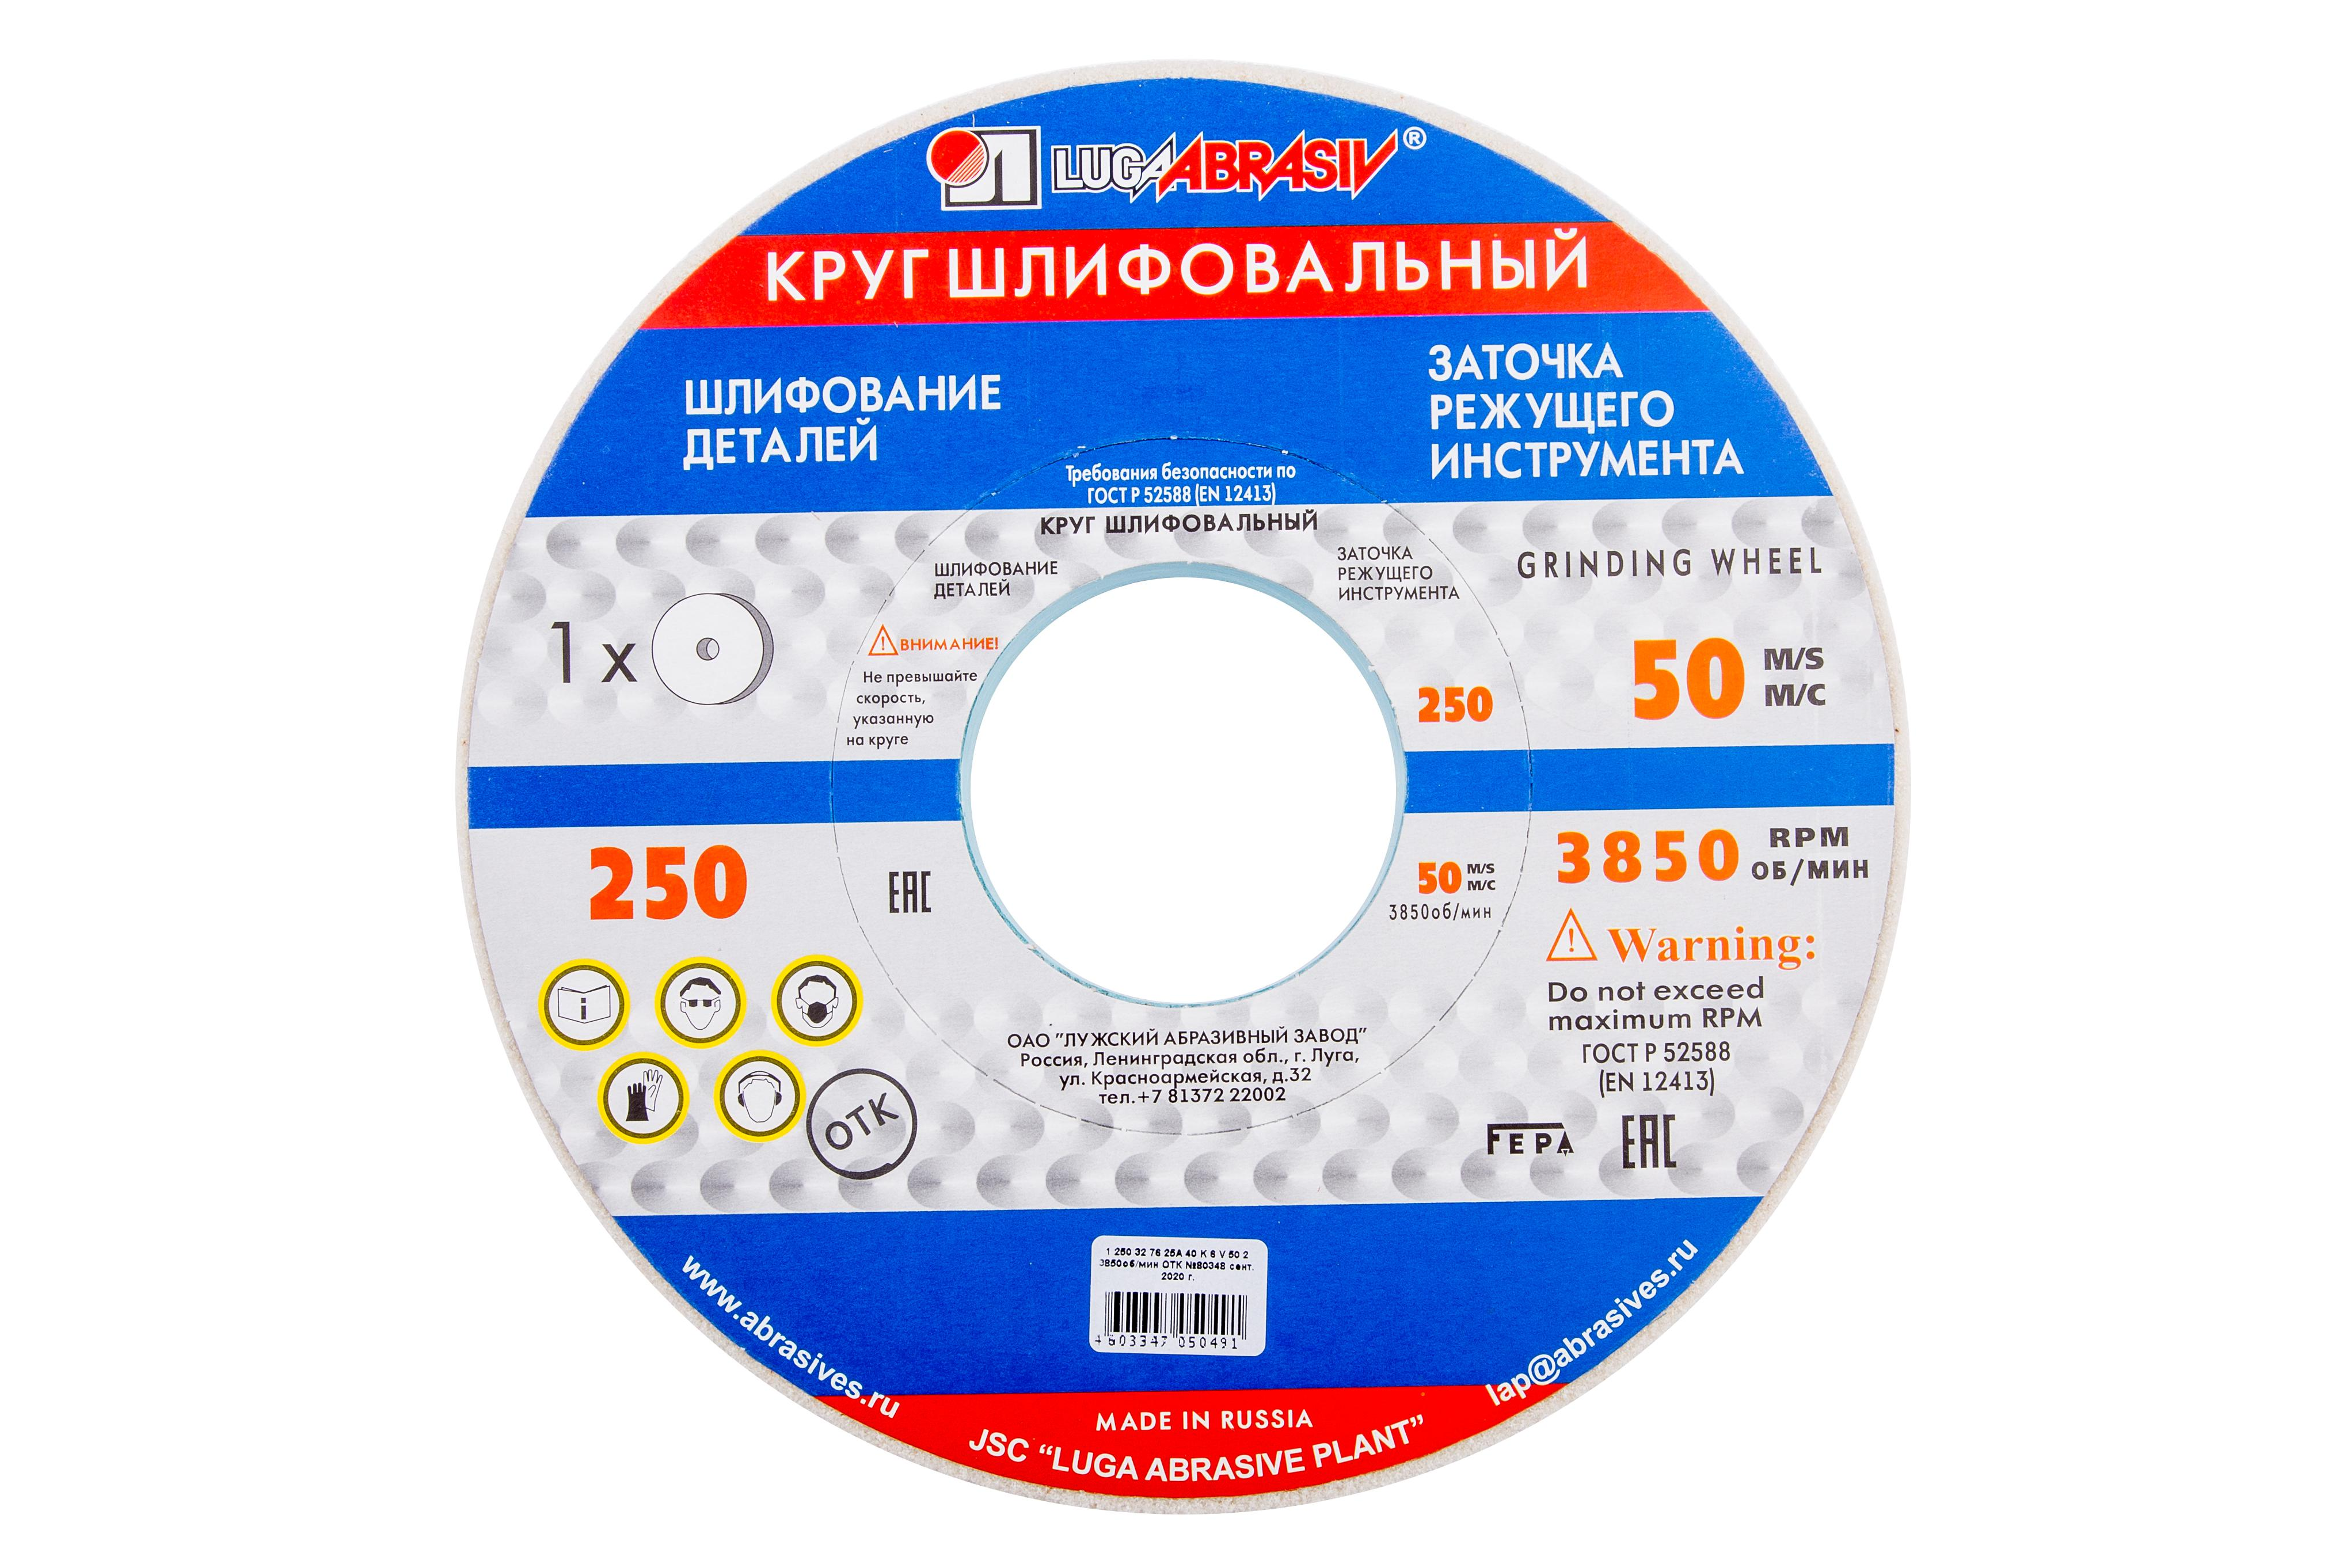 Купить Круг шлифовальный ЛУГА-АБРАЗИВ 1 250 Х 32 Х 76 25А 40 k, l